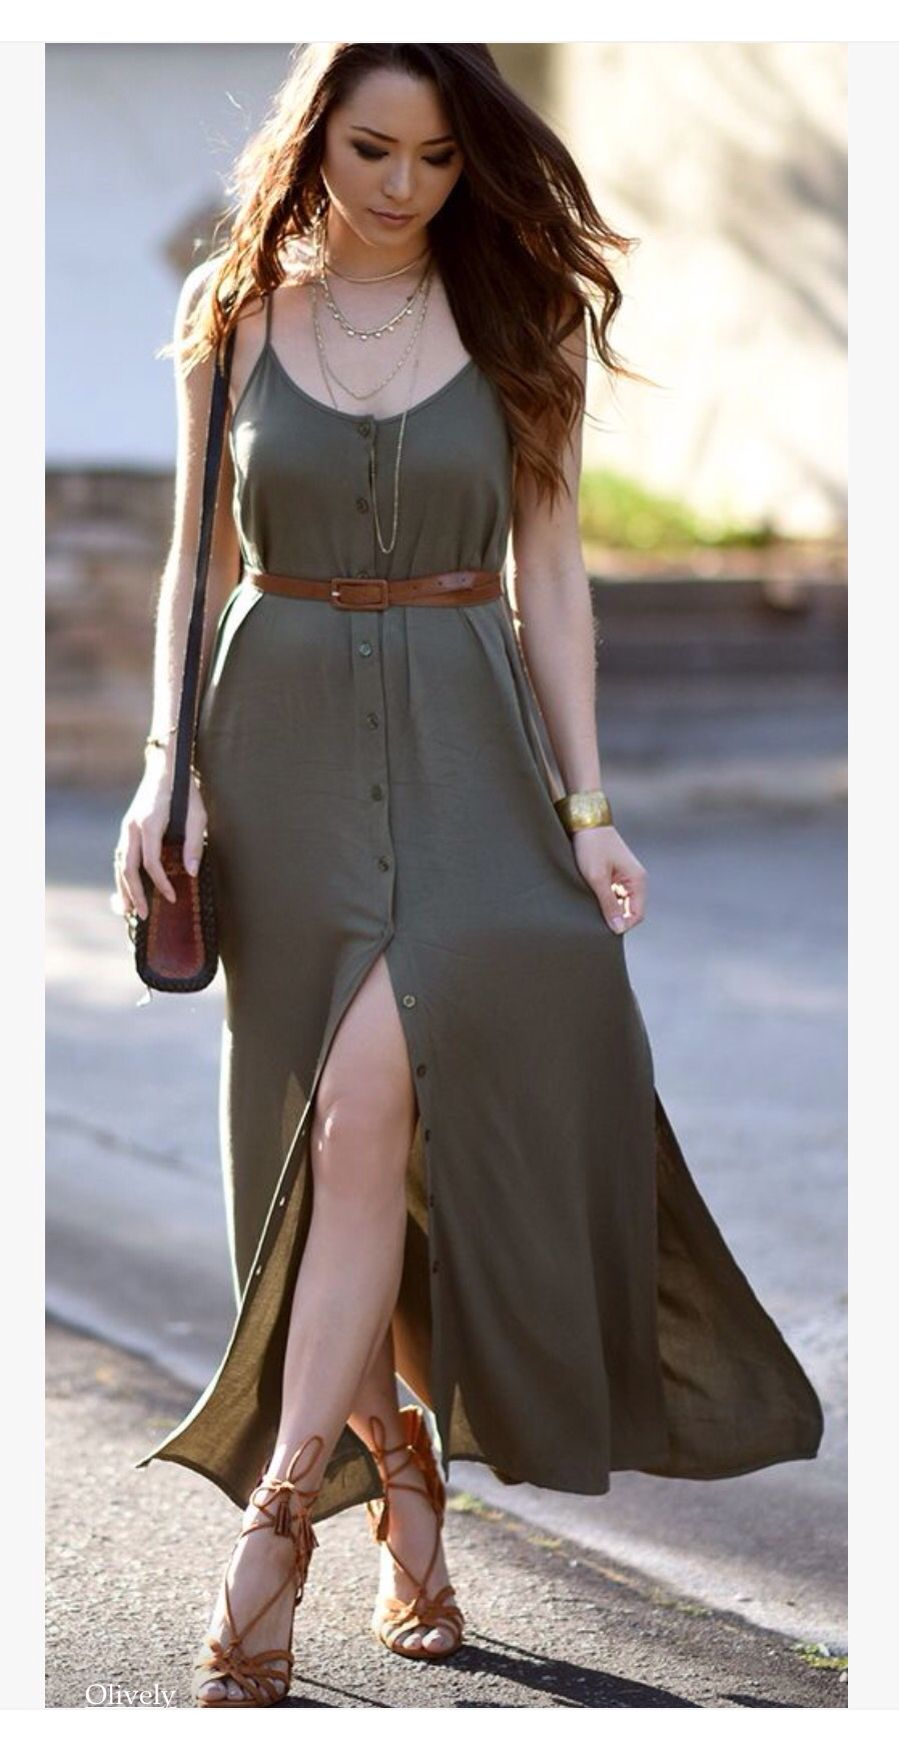 Pin by amber slawek on fashion in pinterest dresses